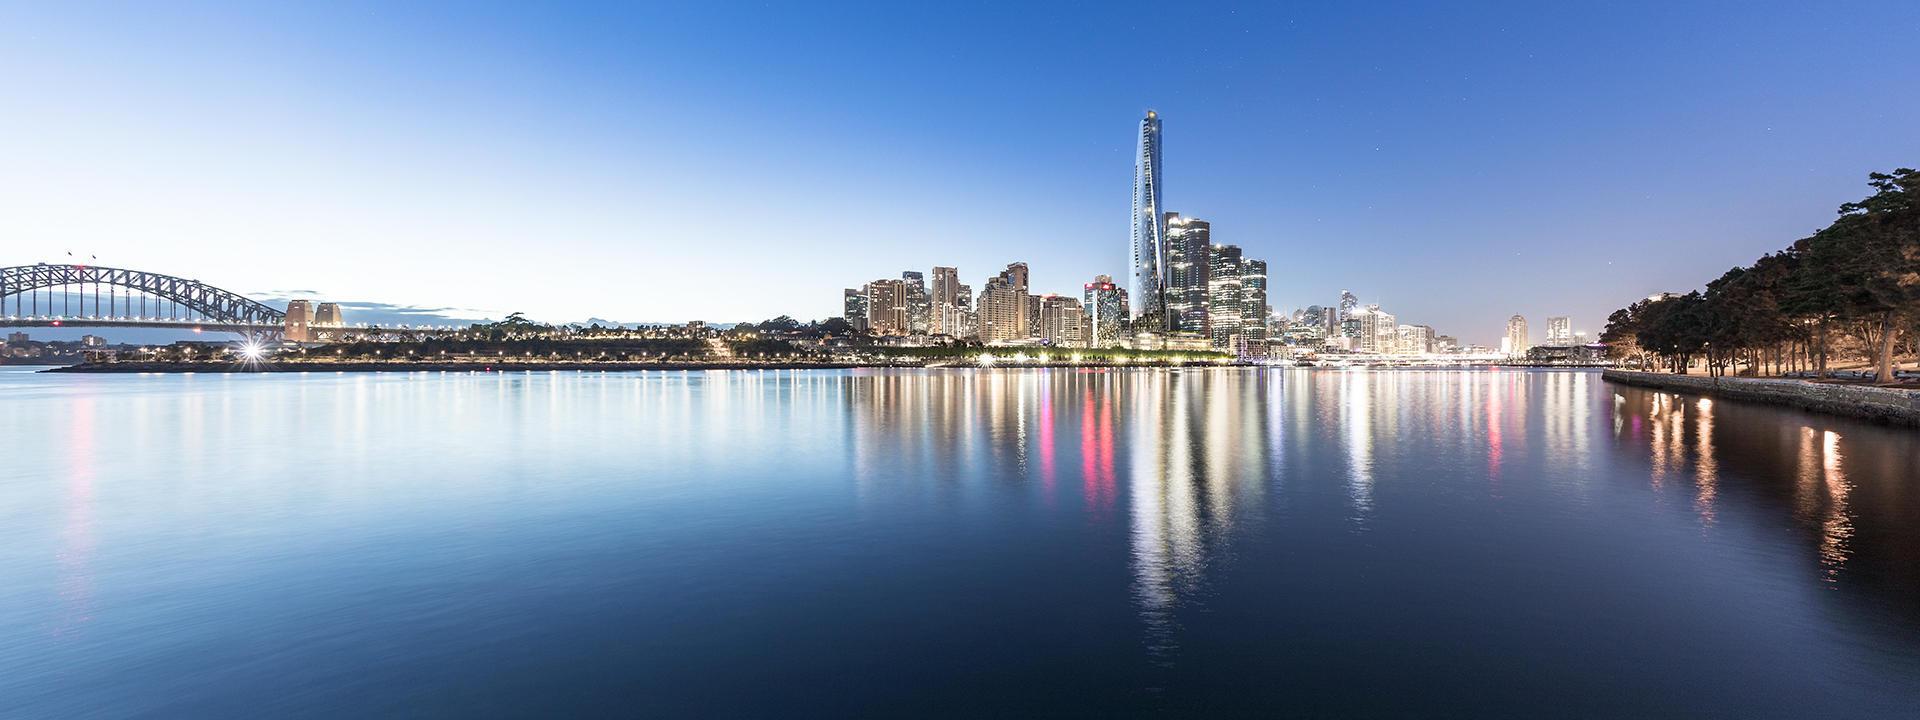 Crown Sydney Announces Partnership With Australian Designer Arthur Galan